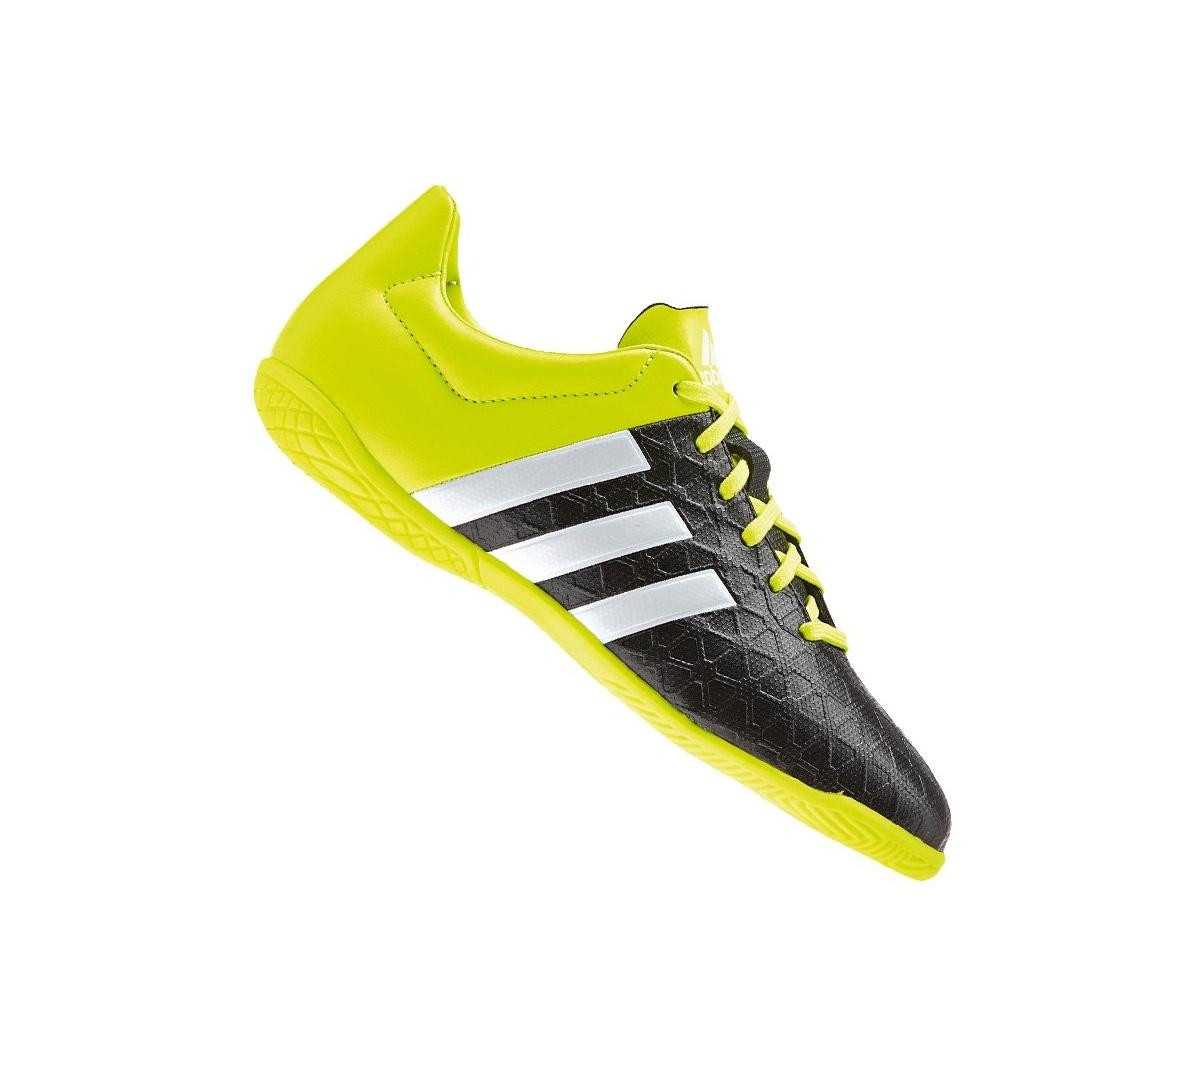 a542870337207 Tênis Adidas Ace 15 4 Futsal Infantil - Mundo do Futebol